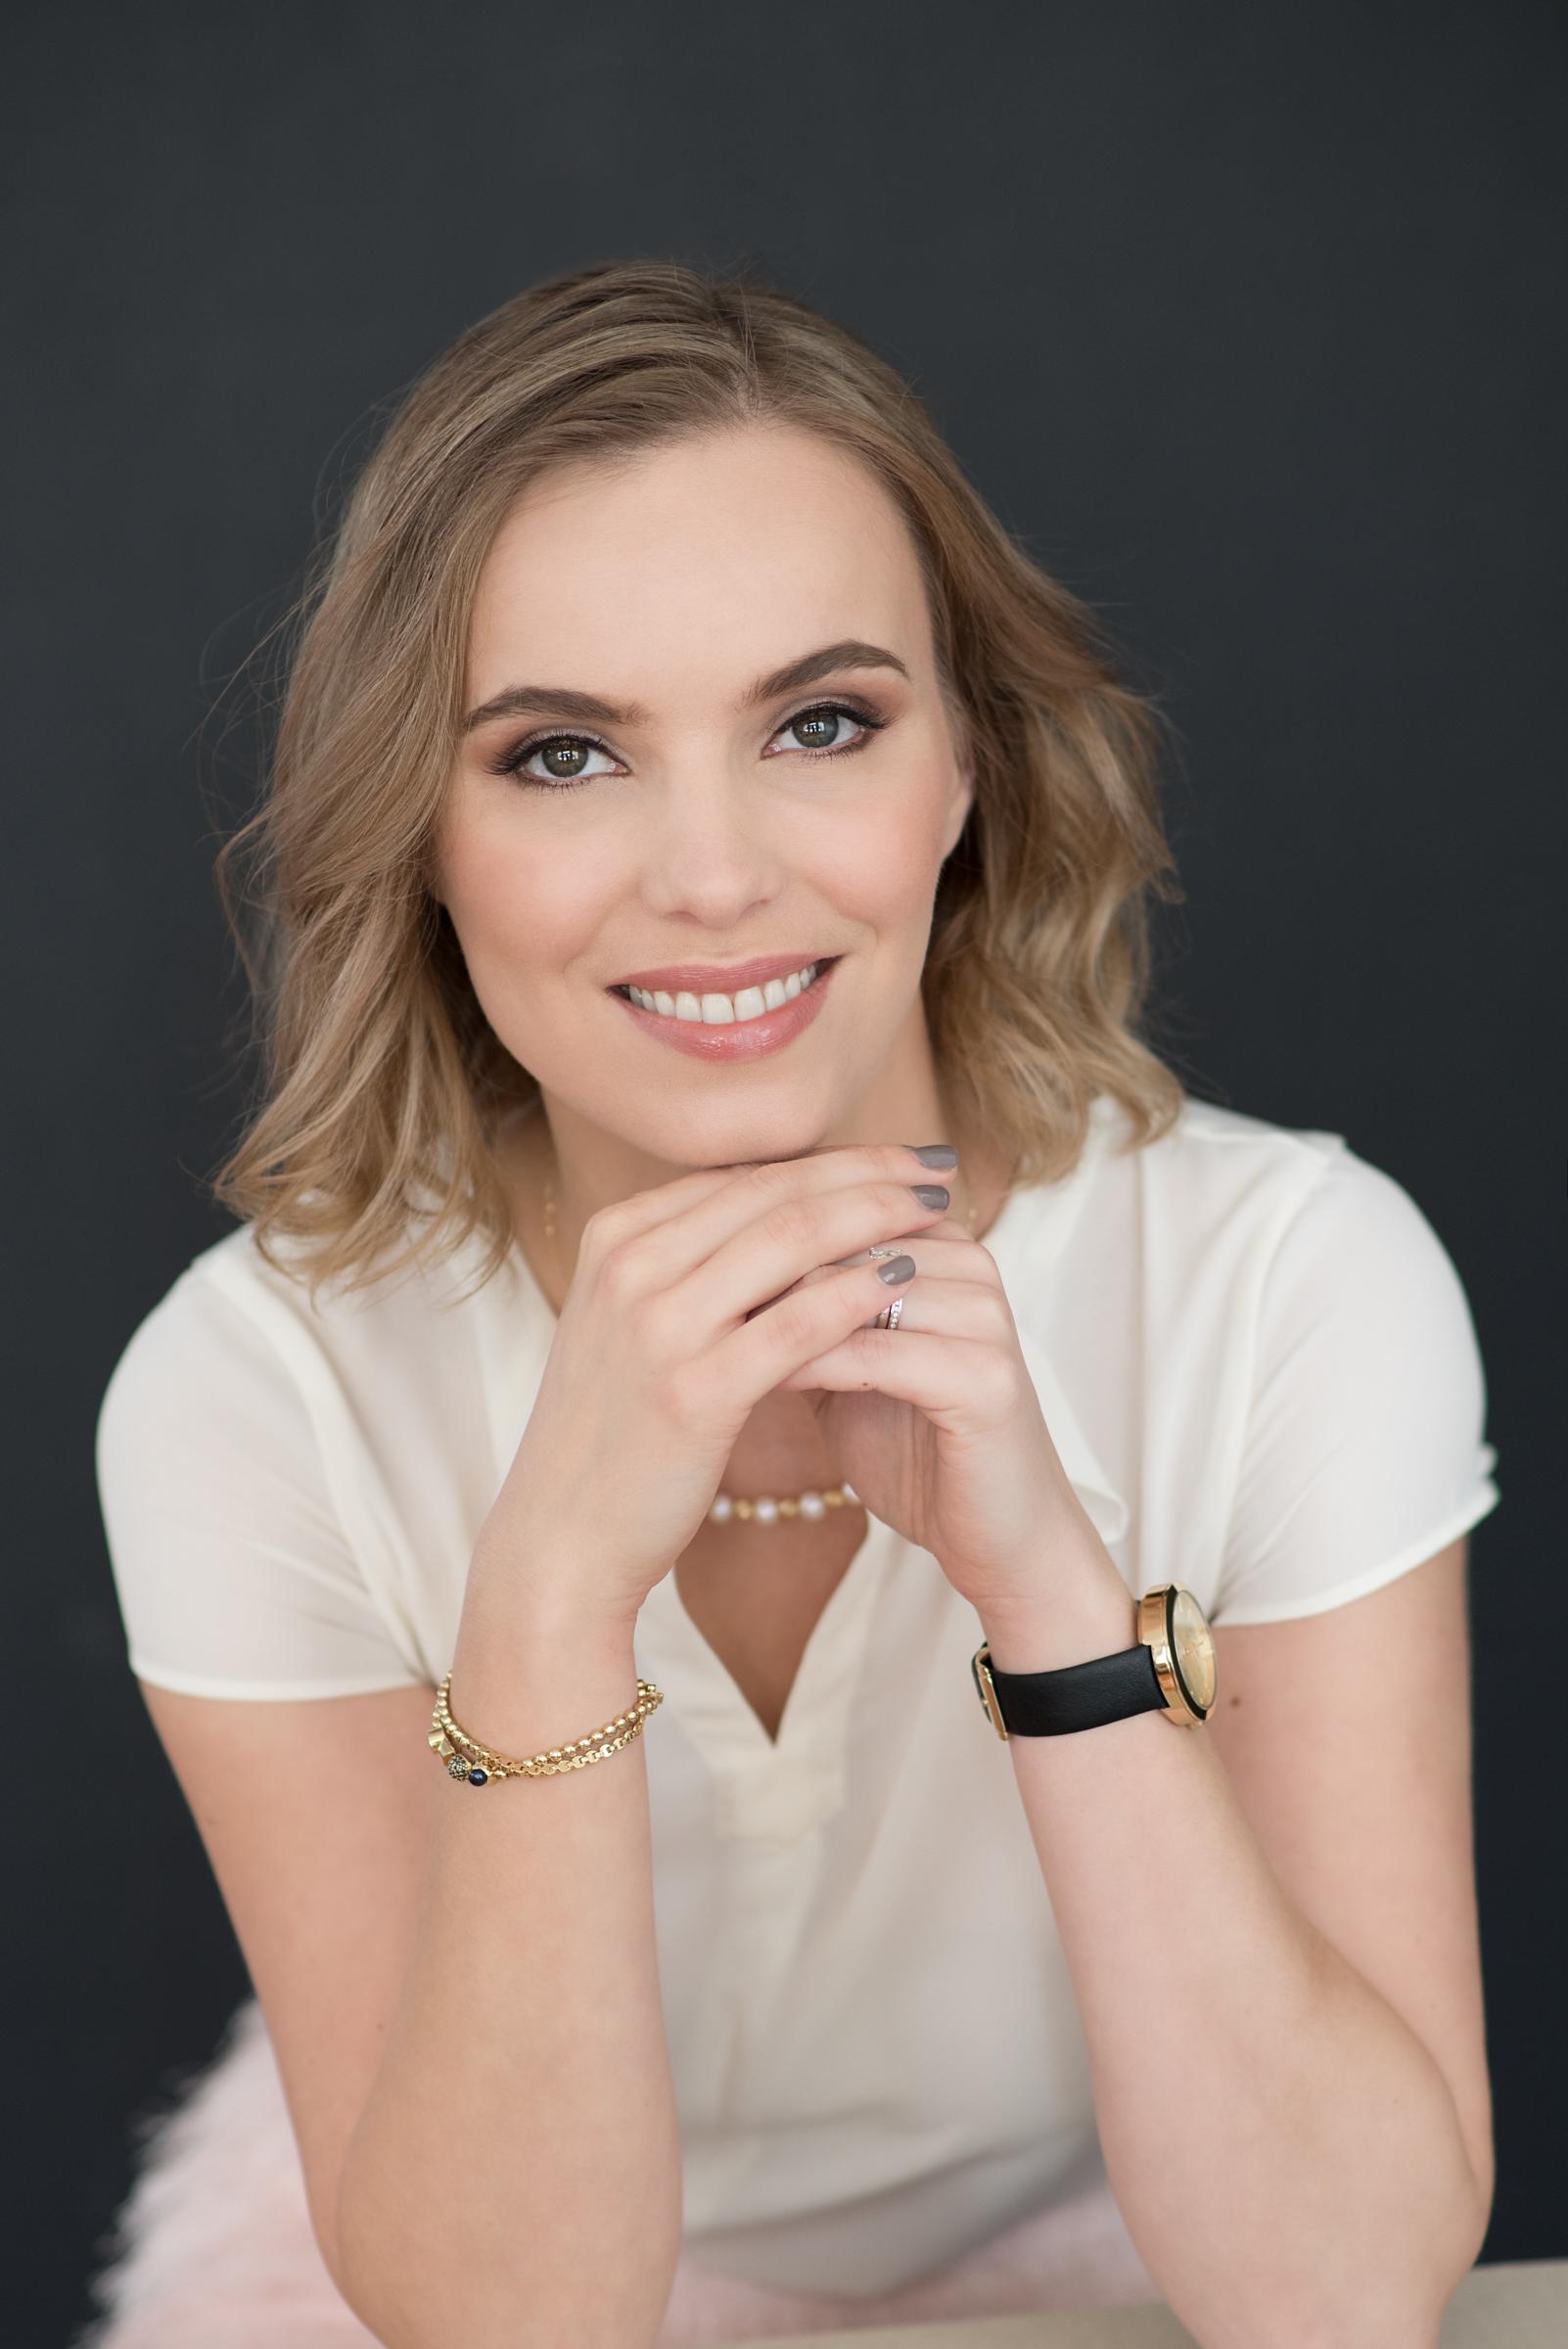 17.Irina Business Portrait.jpg